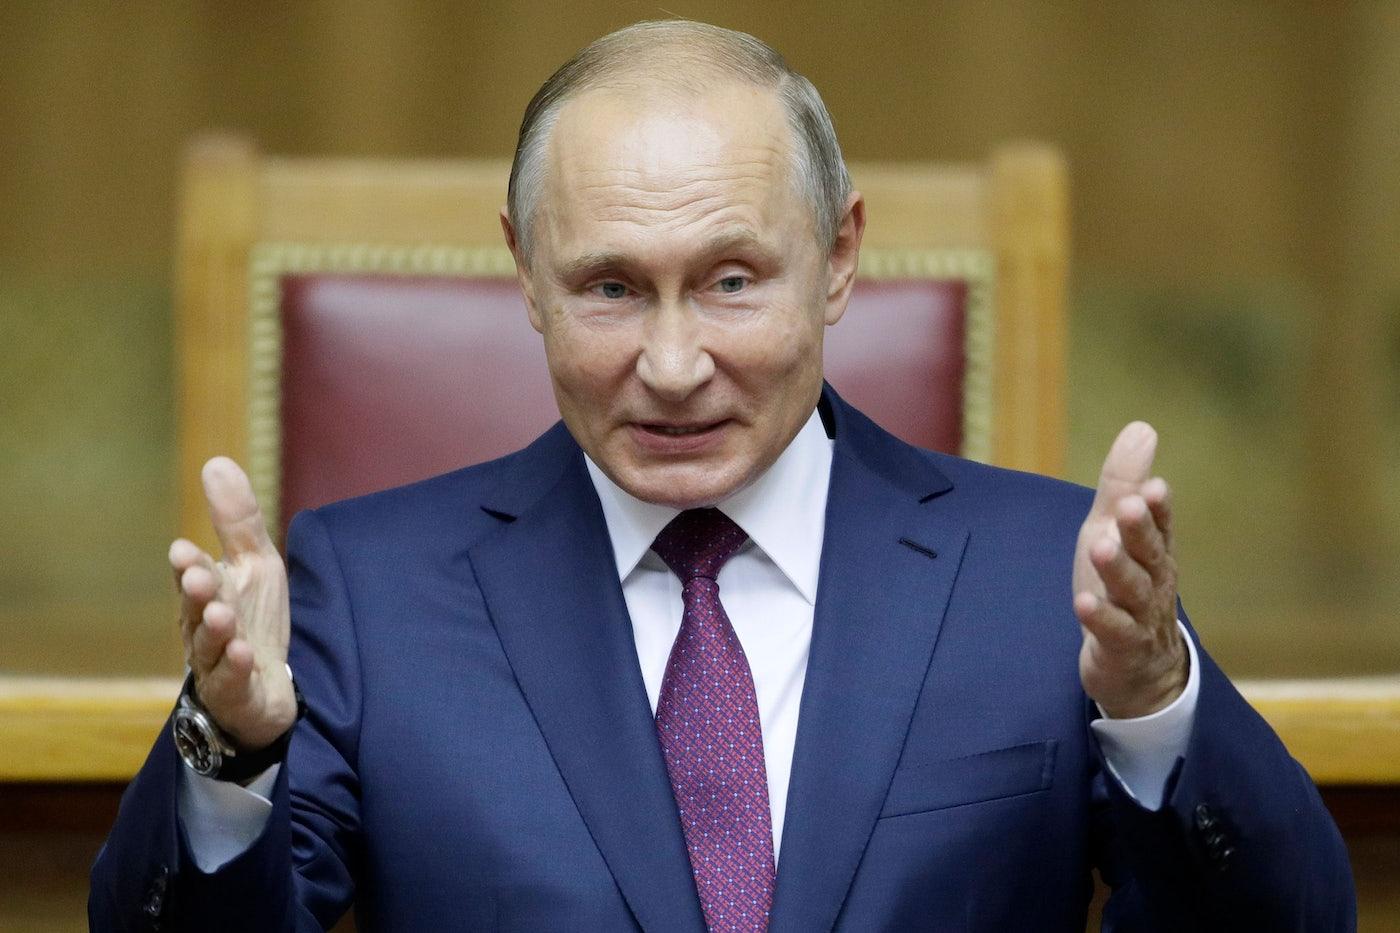 Putin Is Perfecting His Authoritarian Model The New Republic